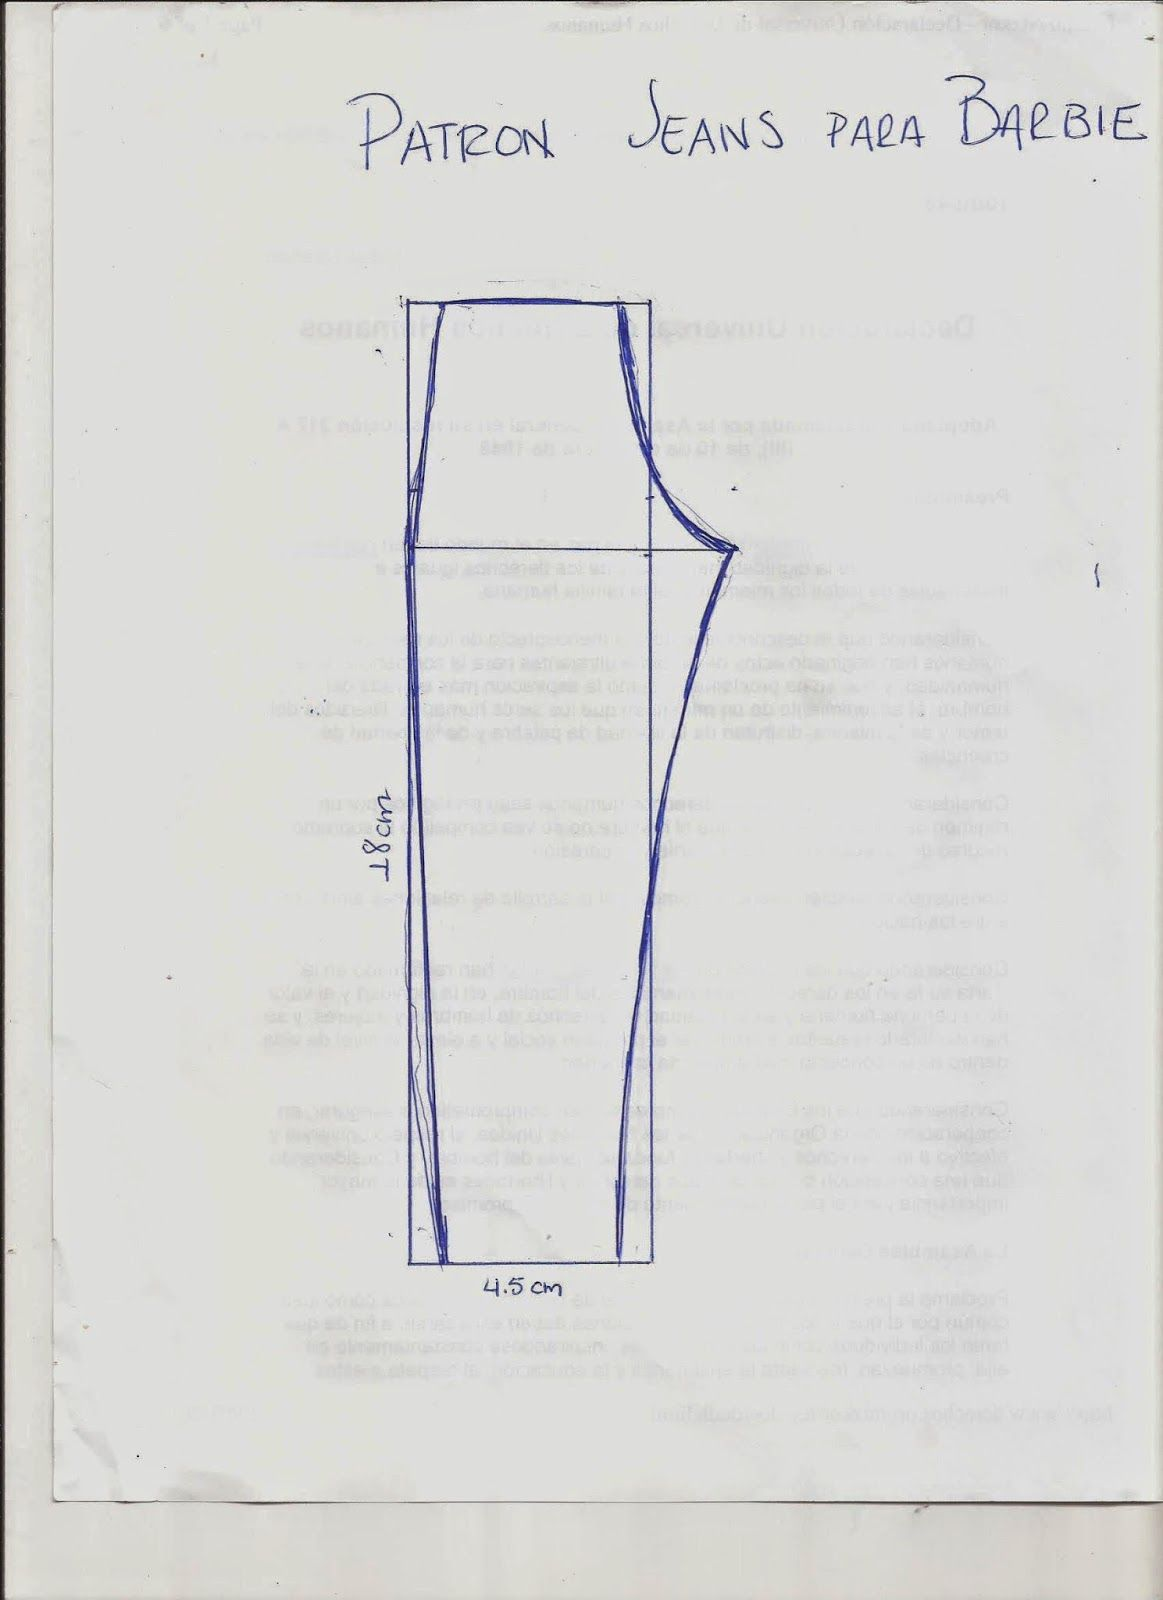 patron de jeans para barbie - Cerca con Google | Vestidos para ...